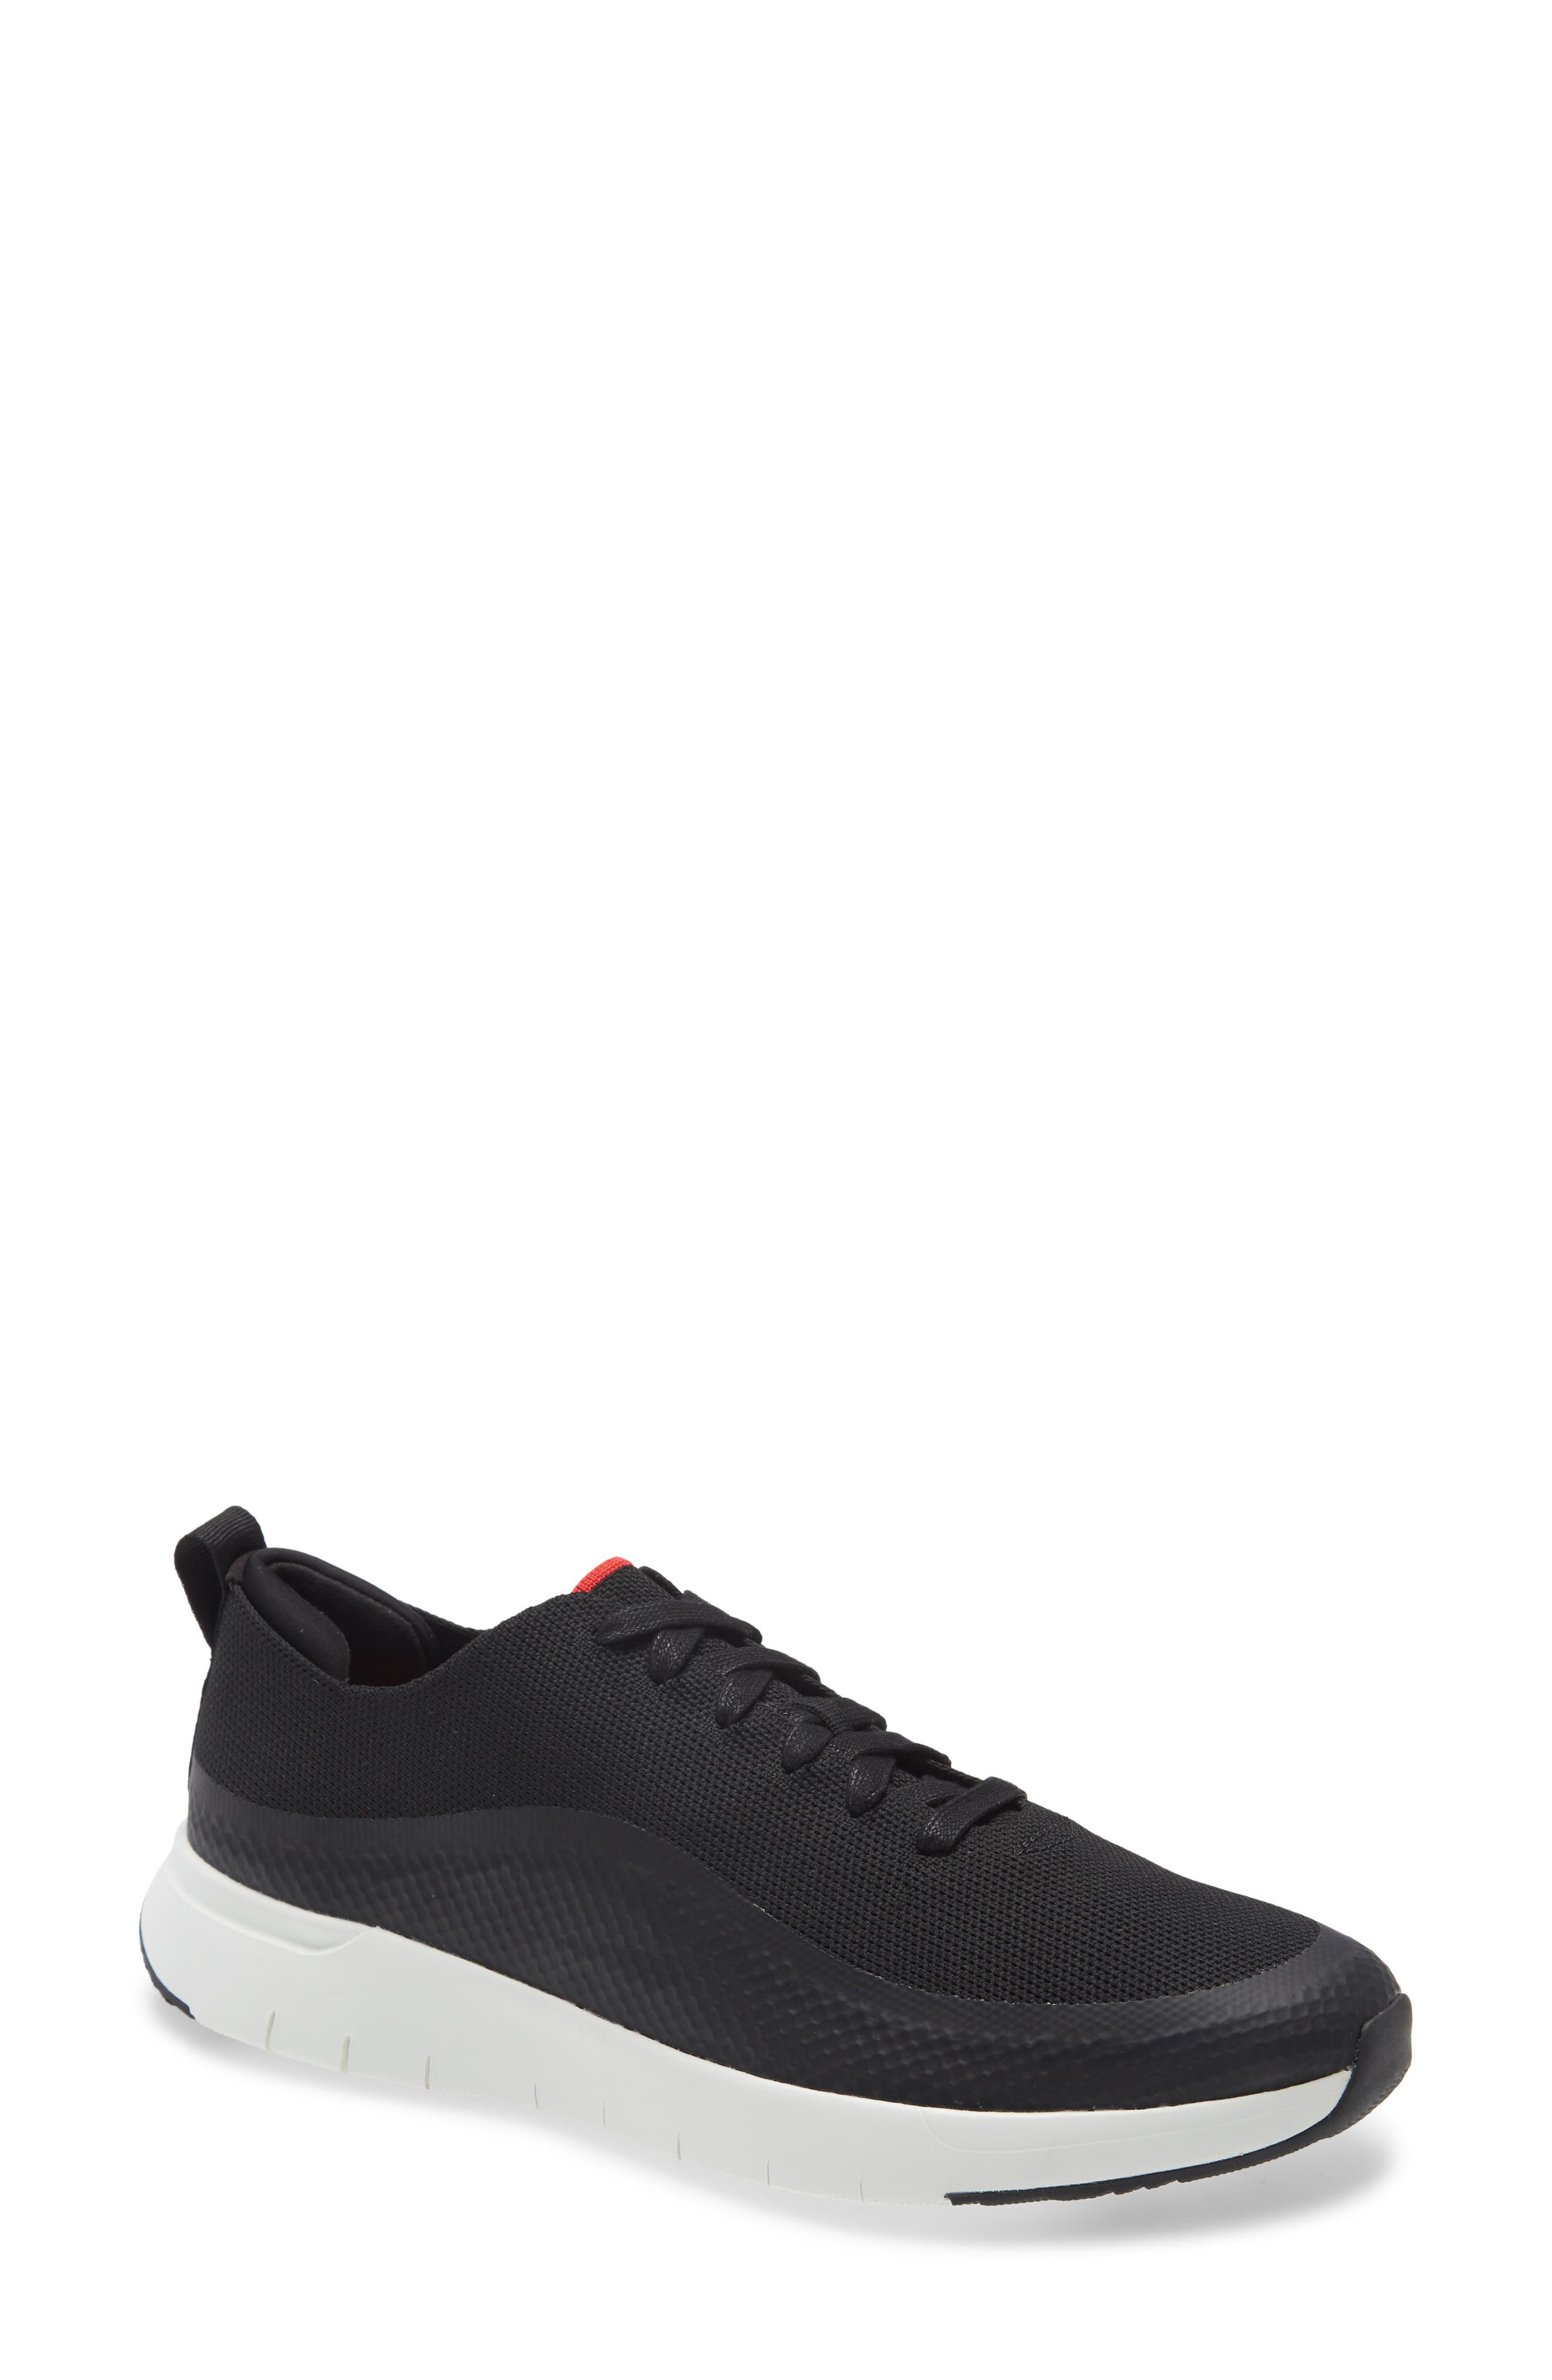 Eversholt Low Top Sneaker